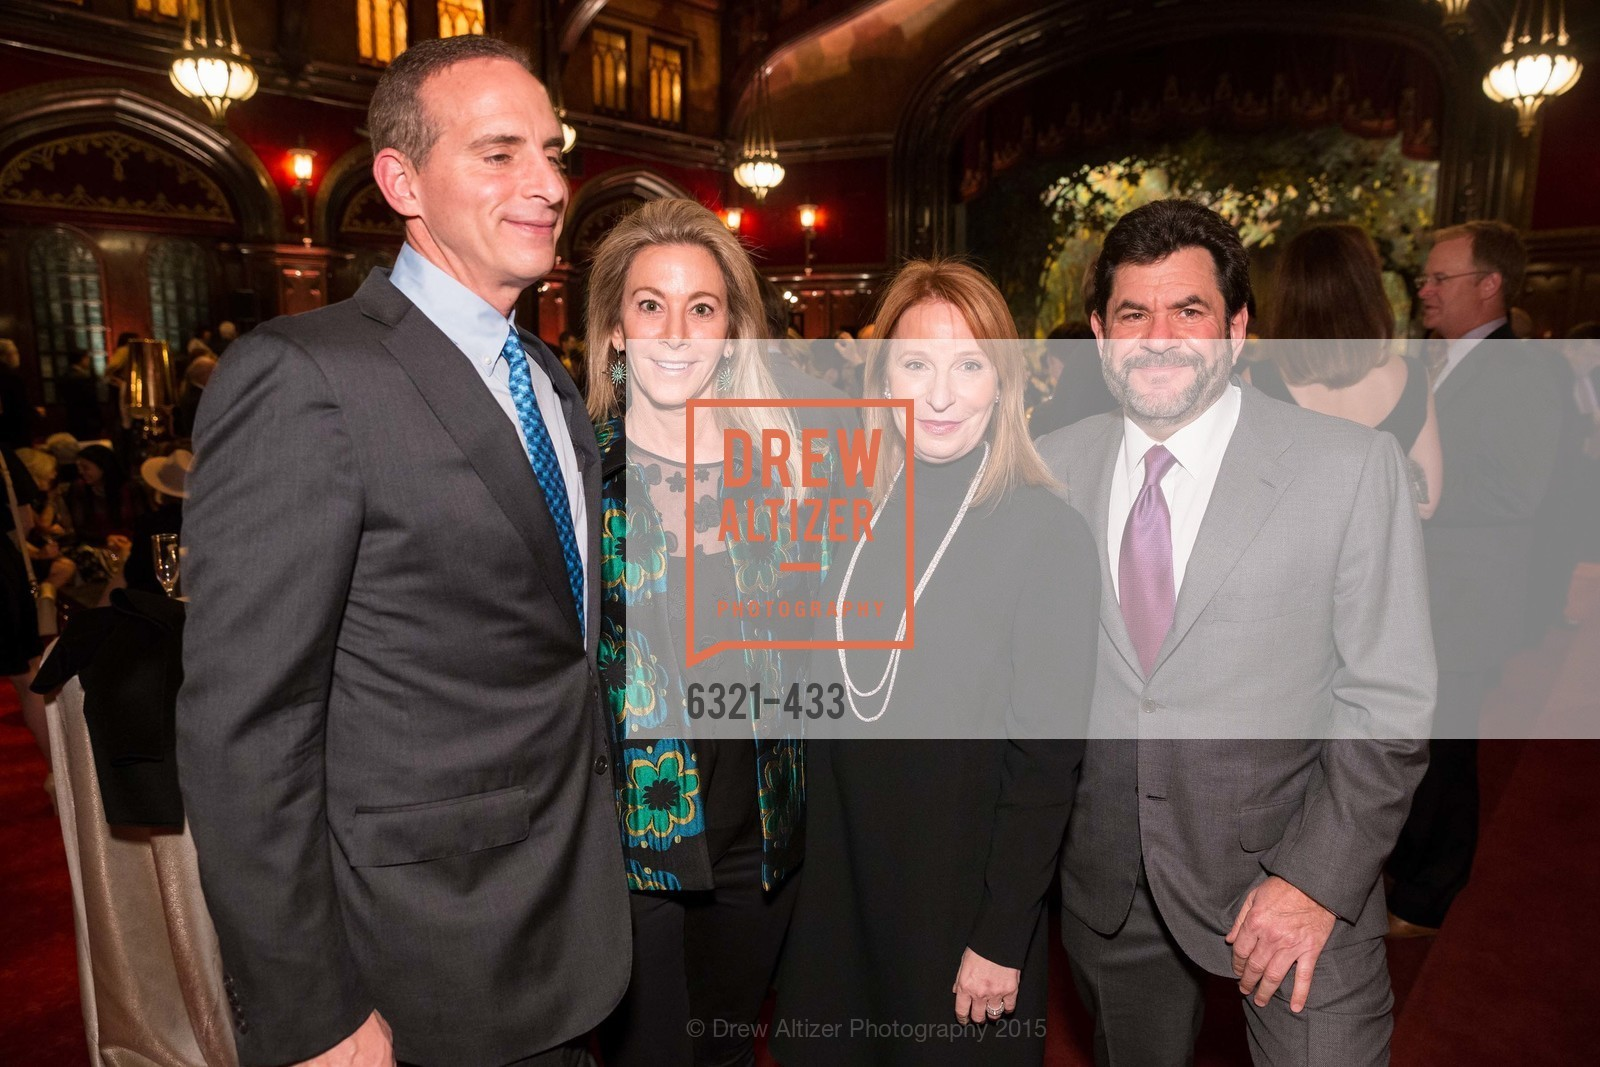 Jim Tananbaum, Dana Tananbaum, Lisa Pritzker, John Pritzker, SFMOMA Contemporary Vision Award, Regency Ballroom. 1300 Van Ness, November 3rd, 2015